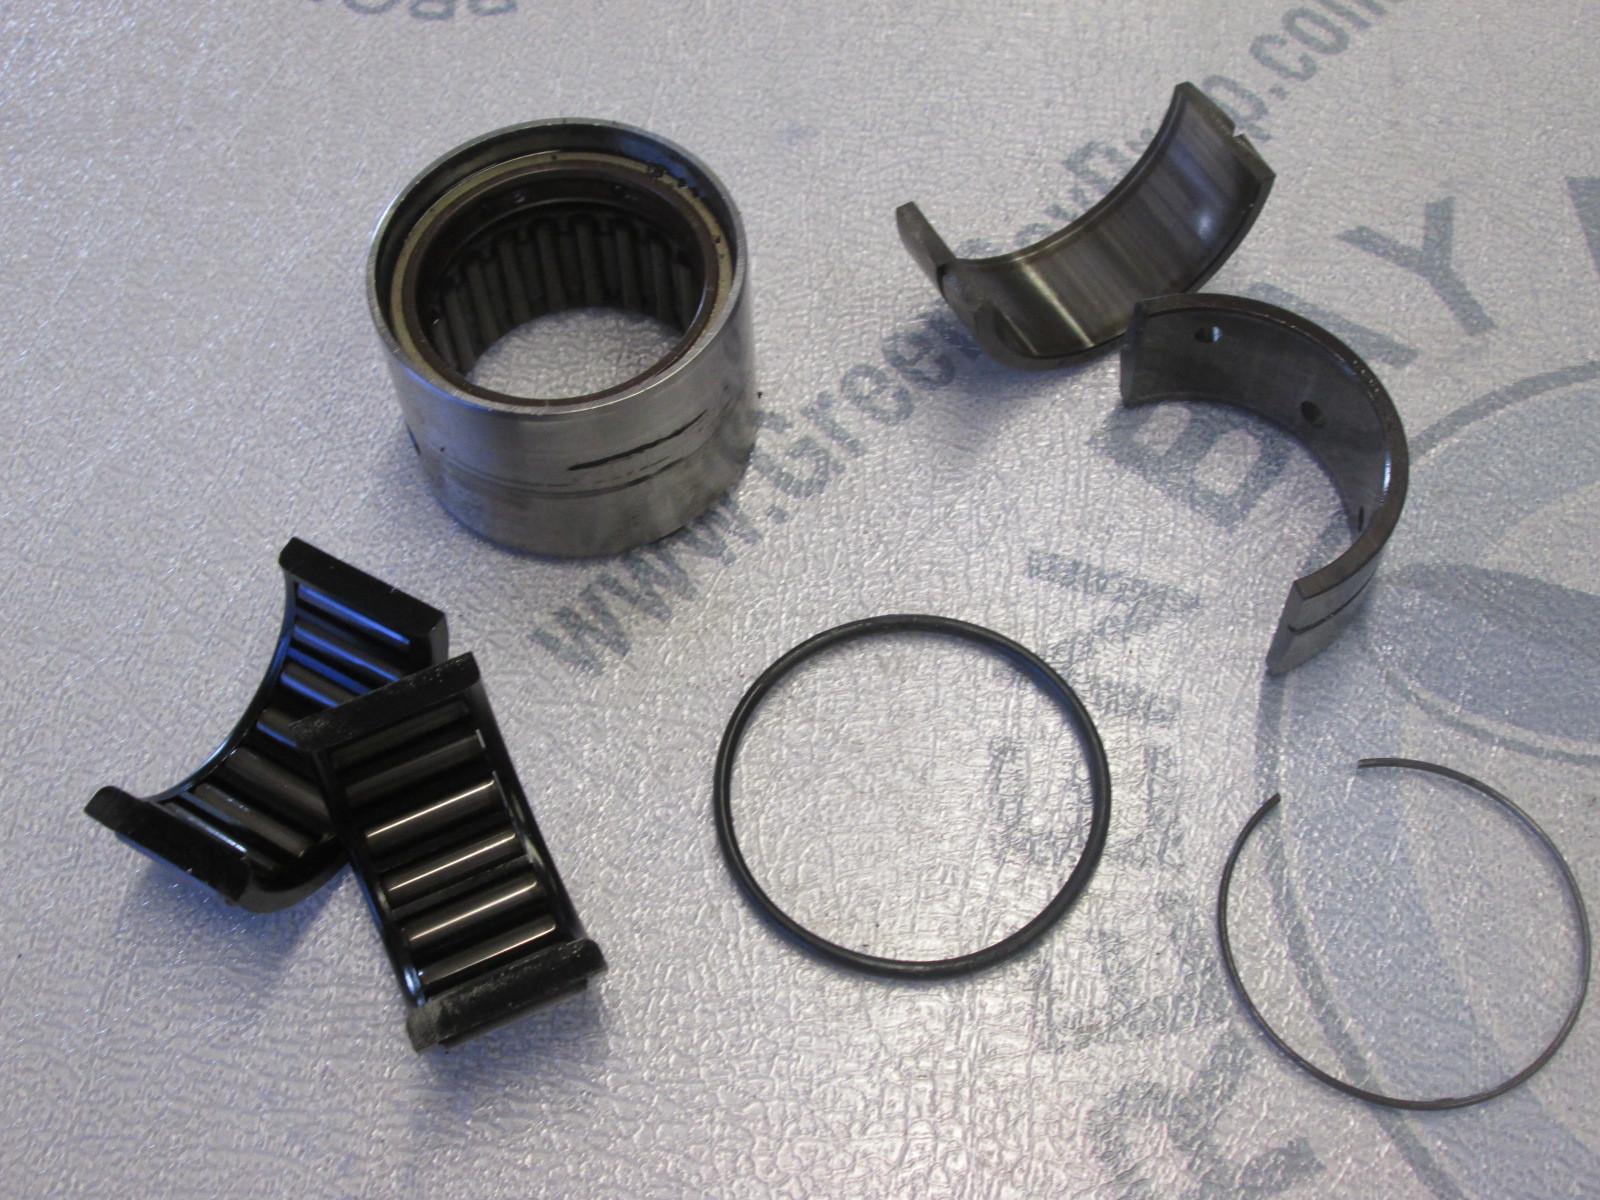 0398529 0310433 Roller Bearing Assembly Evinrude Johnson OMC 35-70 HP